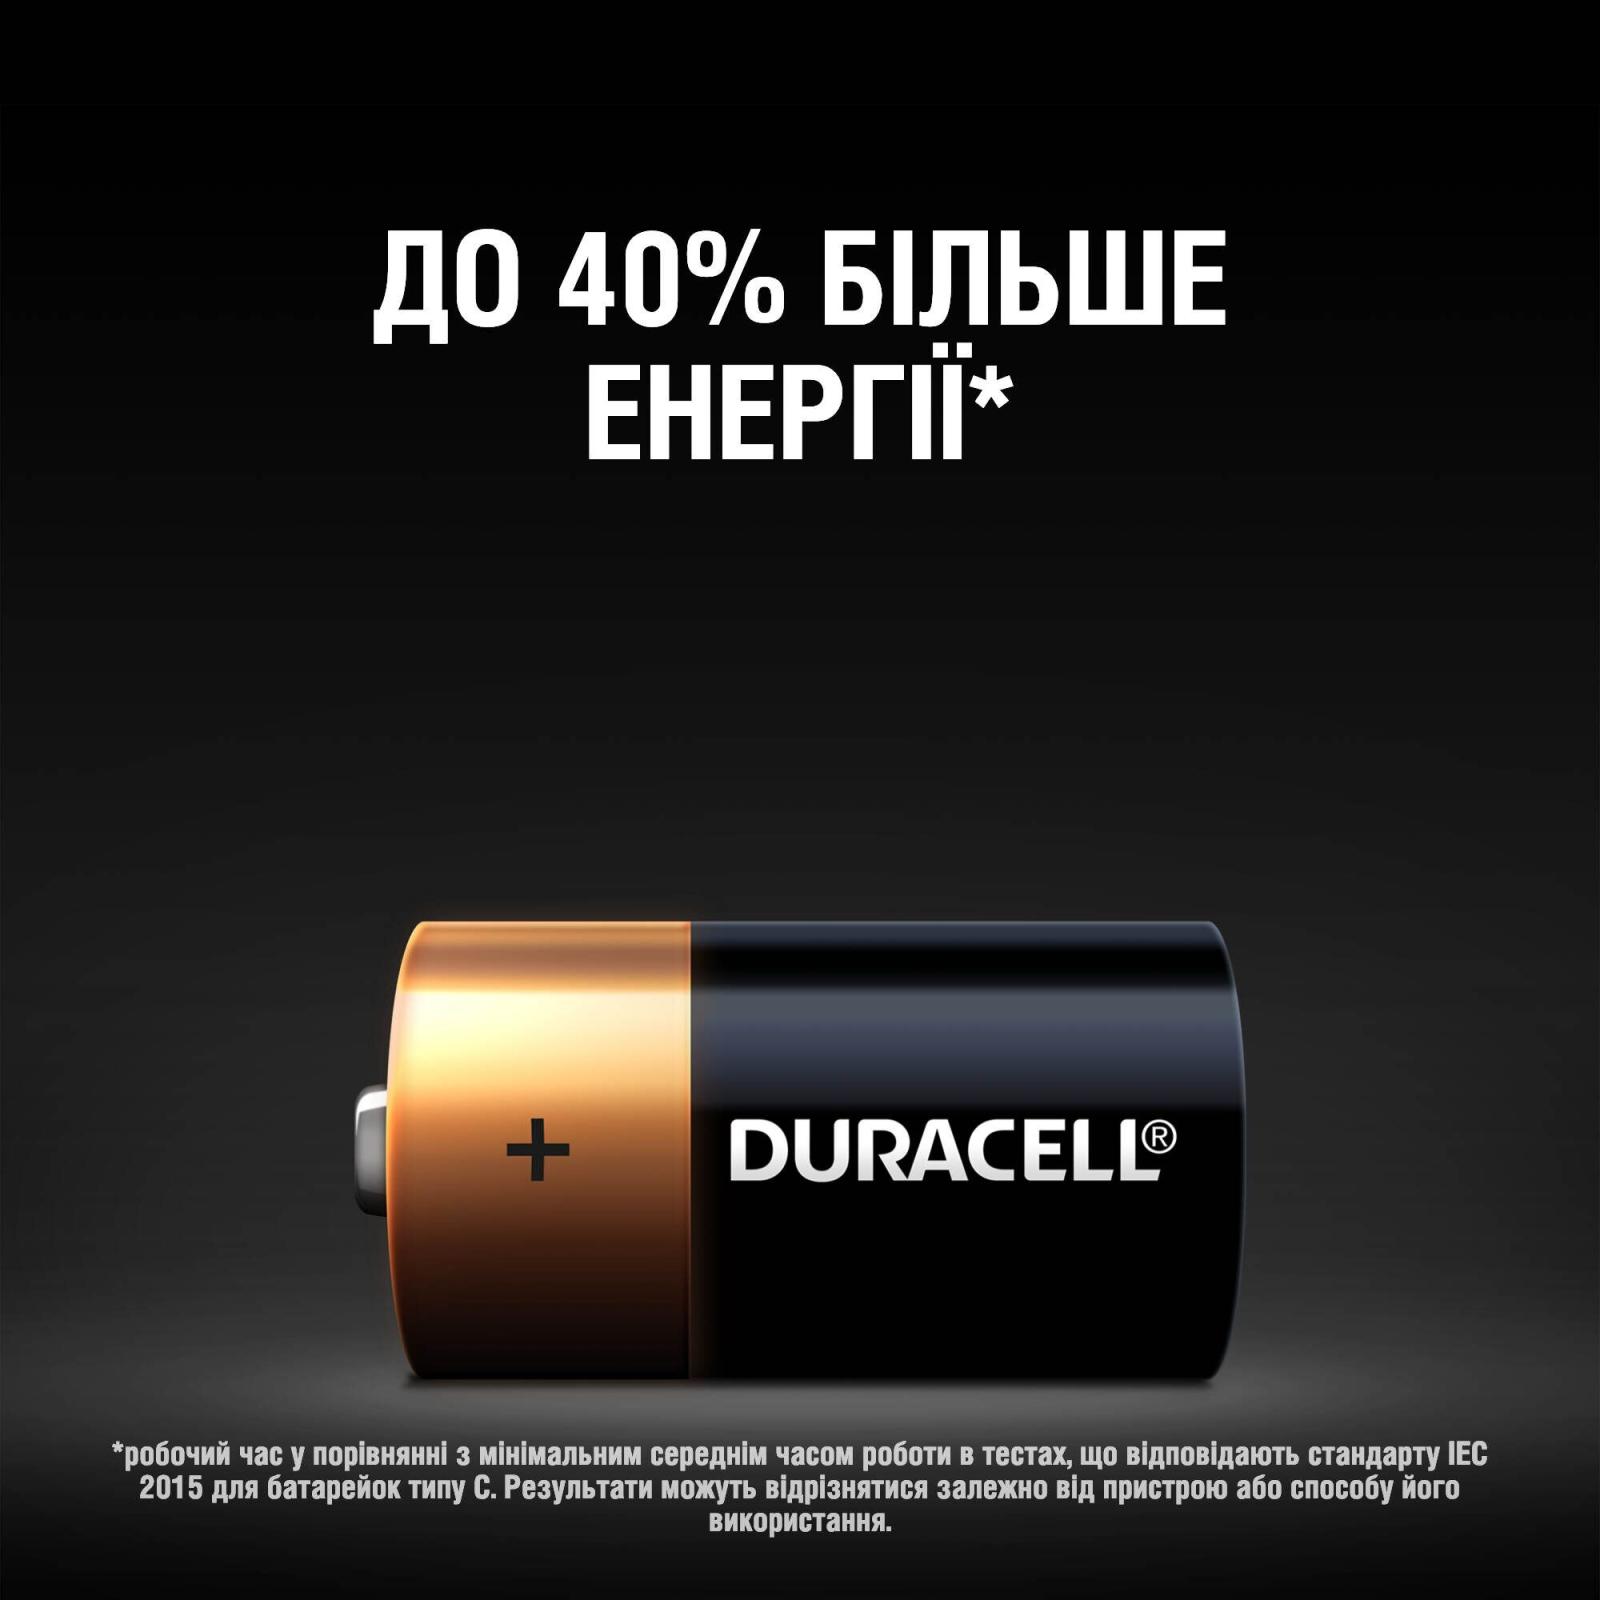 Батарейка C LR14 * 2 Duracell (5000394052529 / 81483545) изображение 4